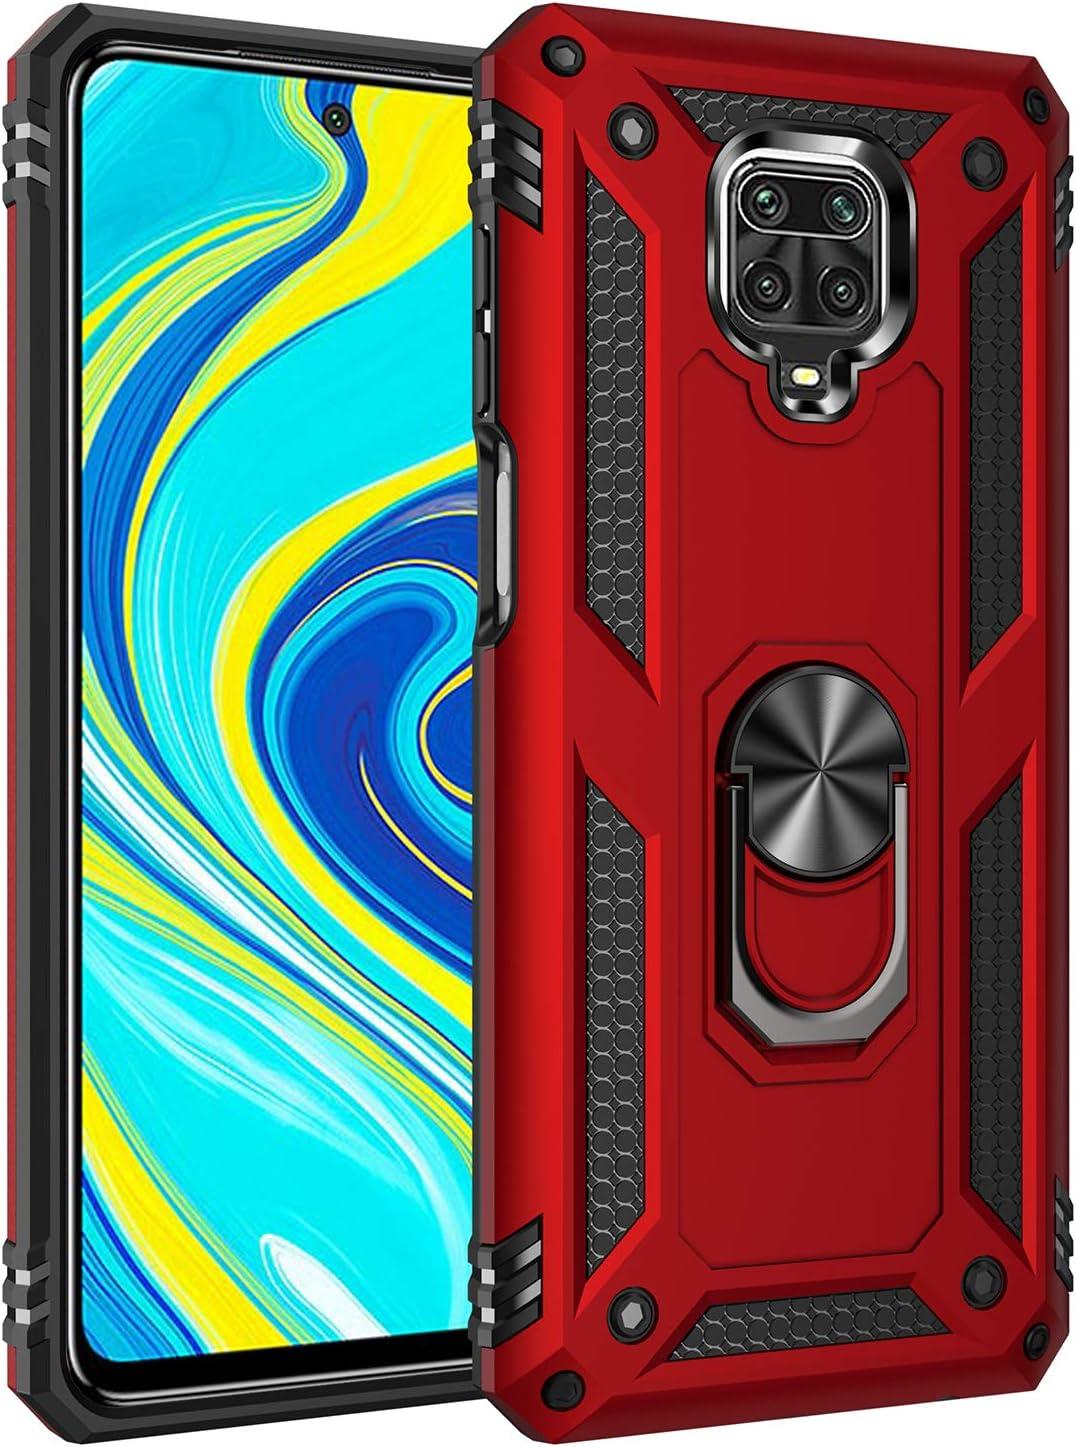 Navy blau Ringhalterung Magnetic Car Mount Series Milit/ärischer Anti-Drop H/ülle TPU//PC 2 in 1 Ultra D/ünn Schutzh/ülle TANYO H/ülle Geeignet f/ür Xiaomi Redmi Note 9S